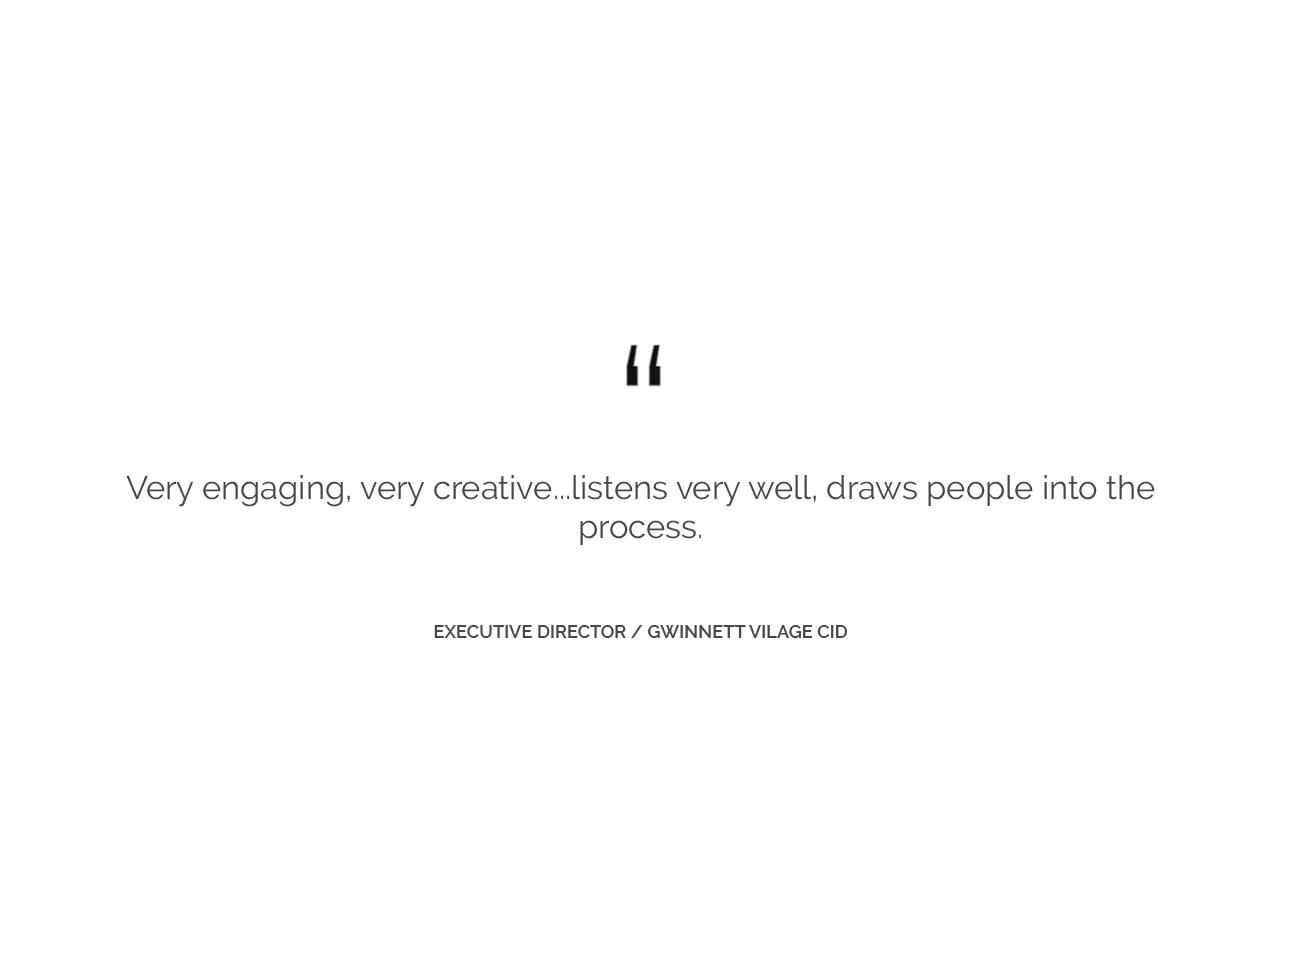 Quote – GV CID QUOTE